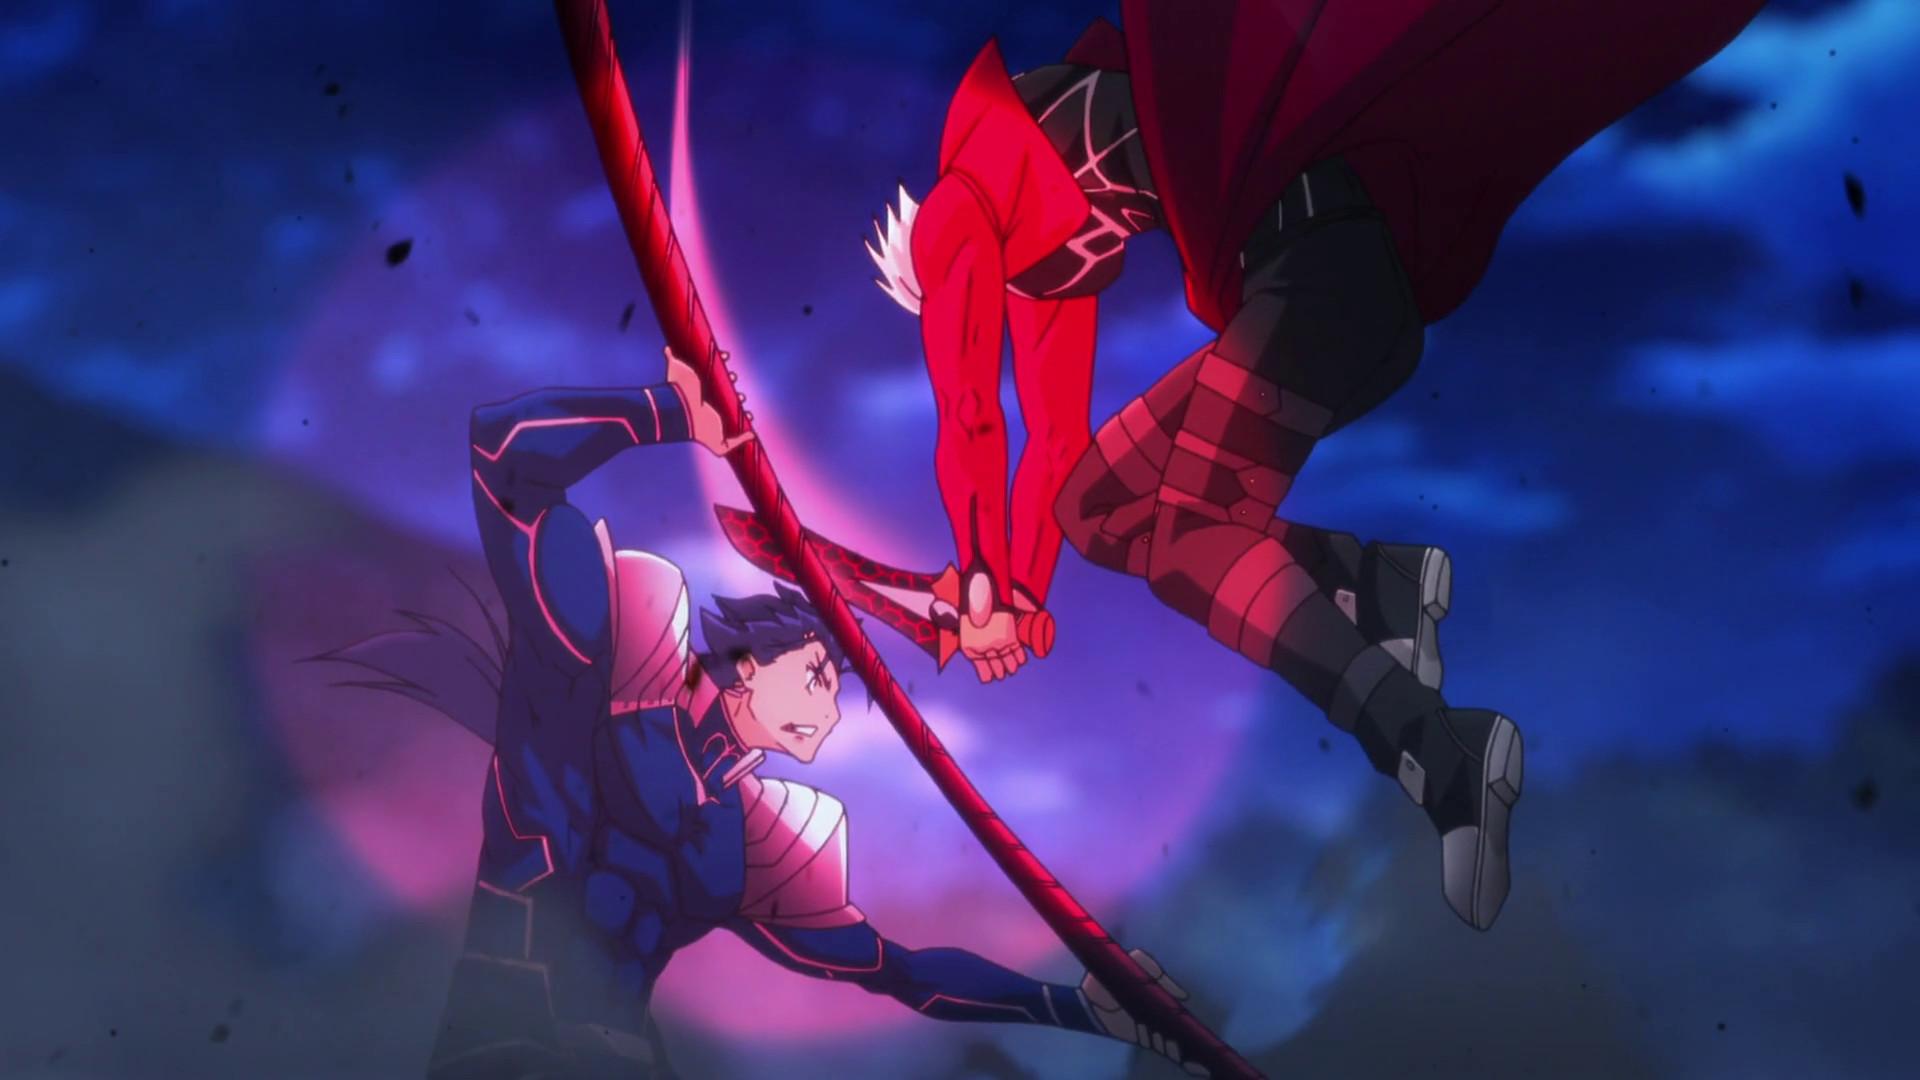 HD Wallpaper | Hintergrund ID:644858. Anime Fate/Stay Night: …